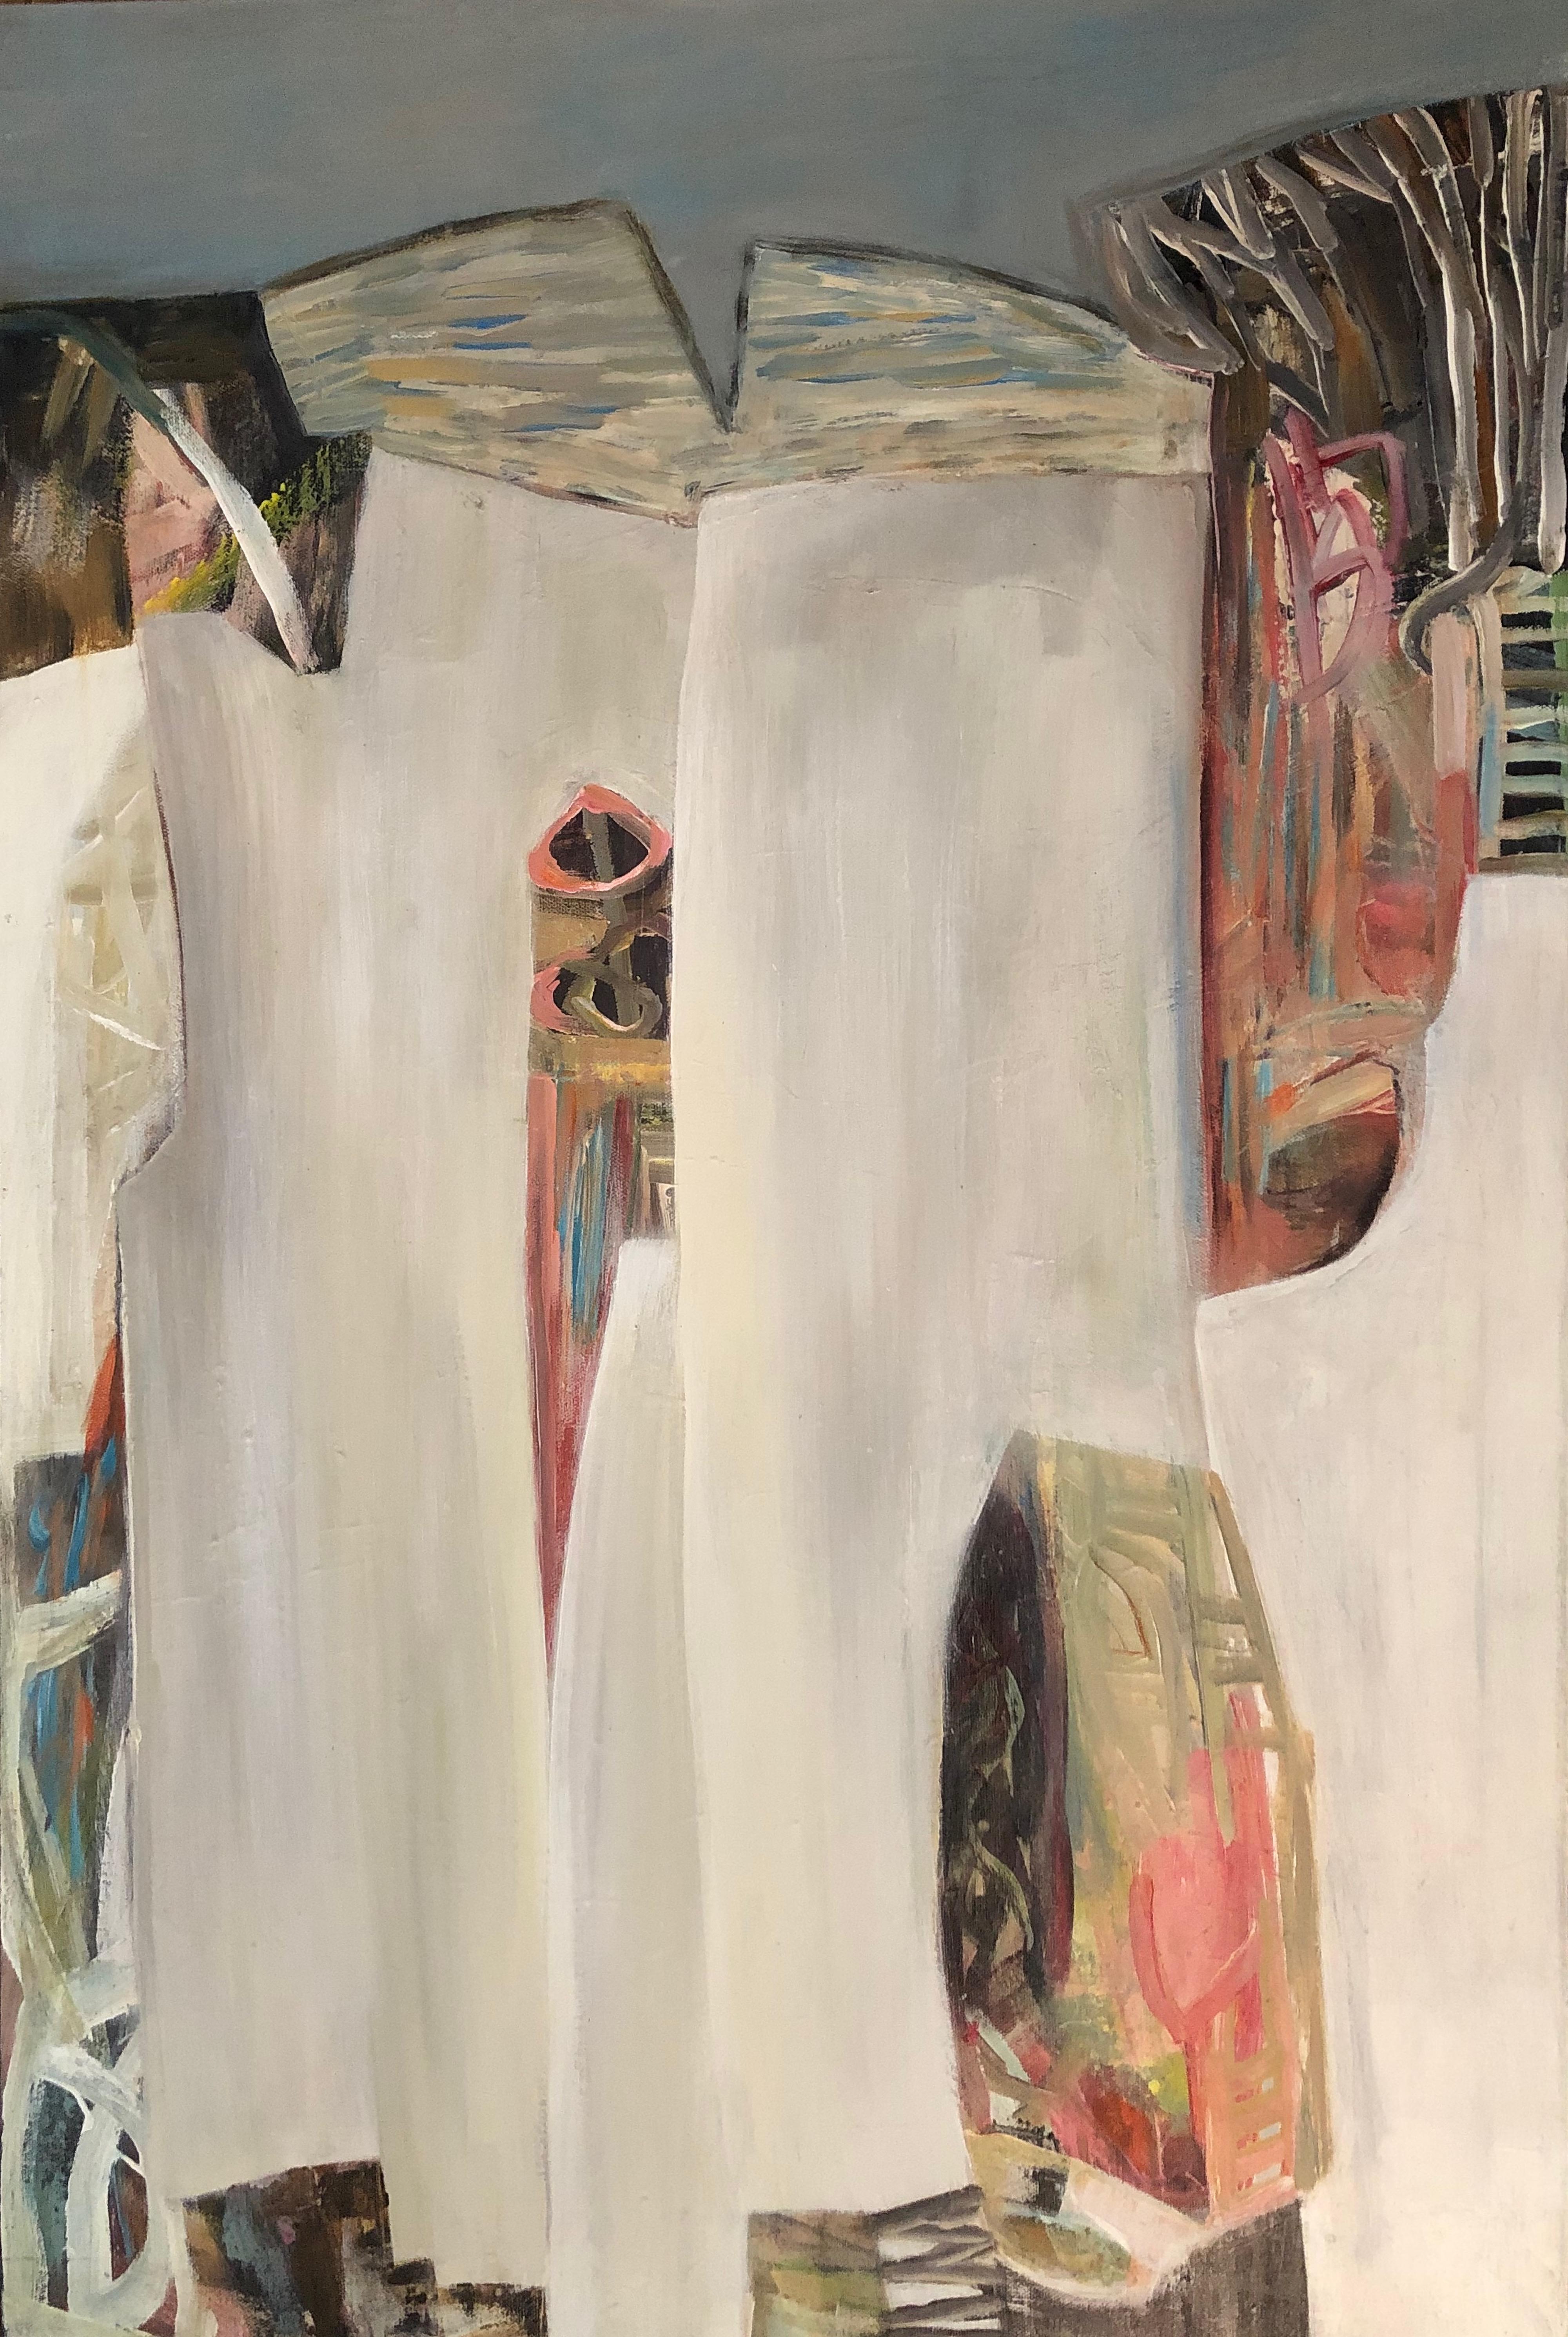 Silken I by Sarah Van Beckum | ArtworkNetwork.com